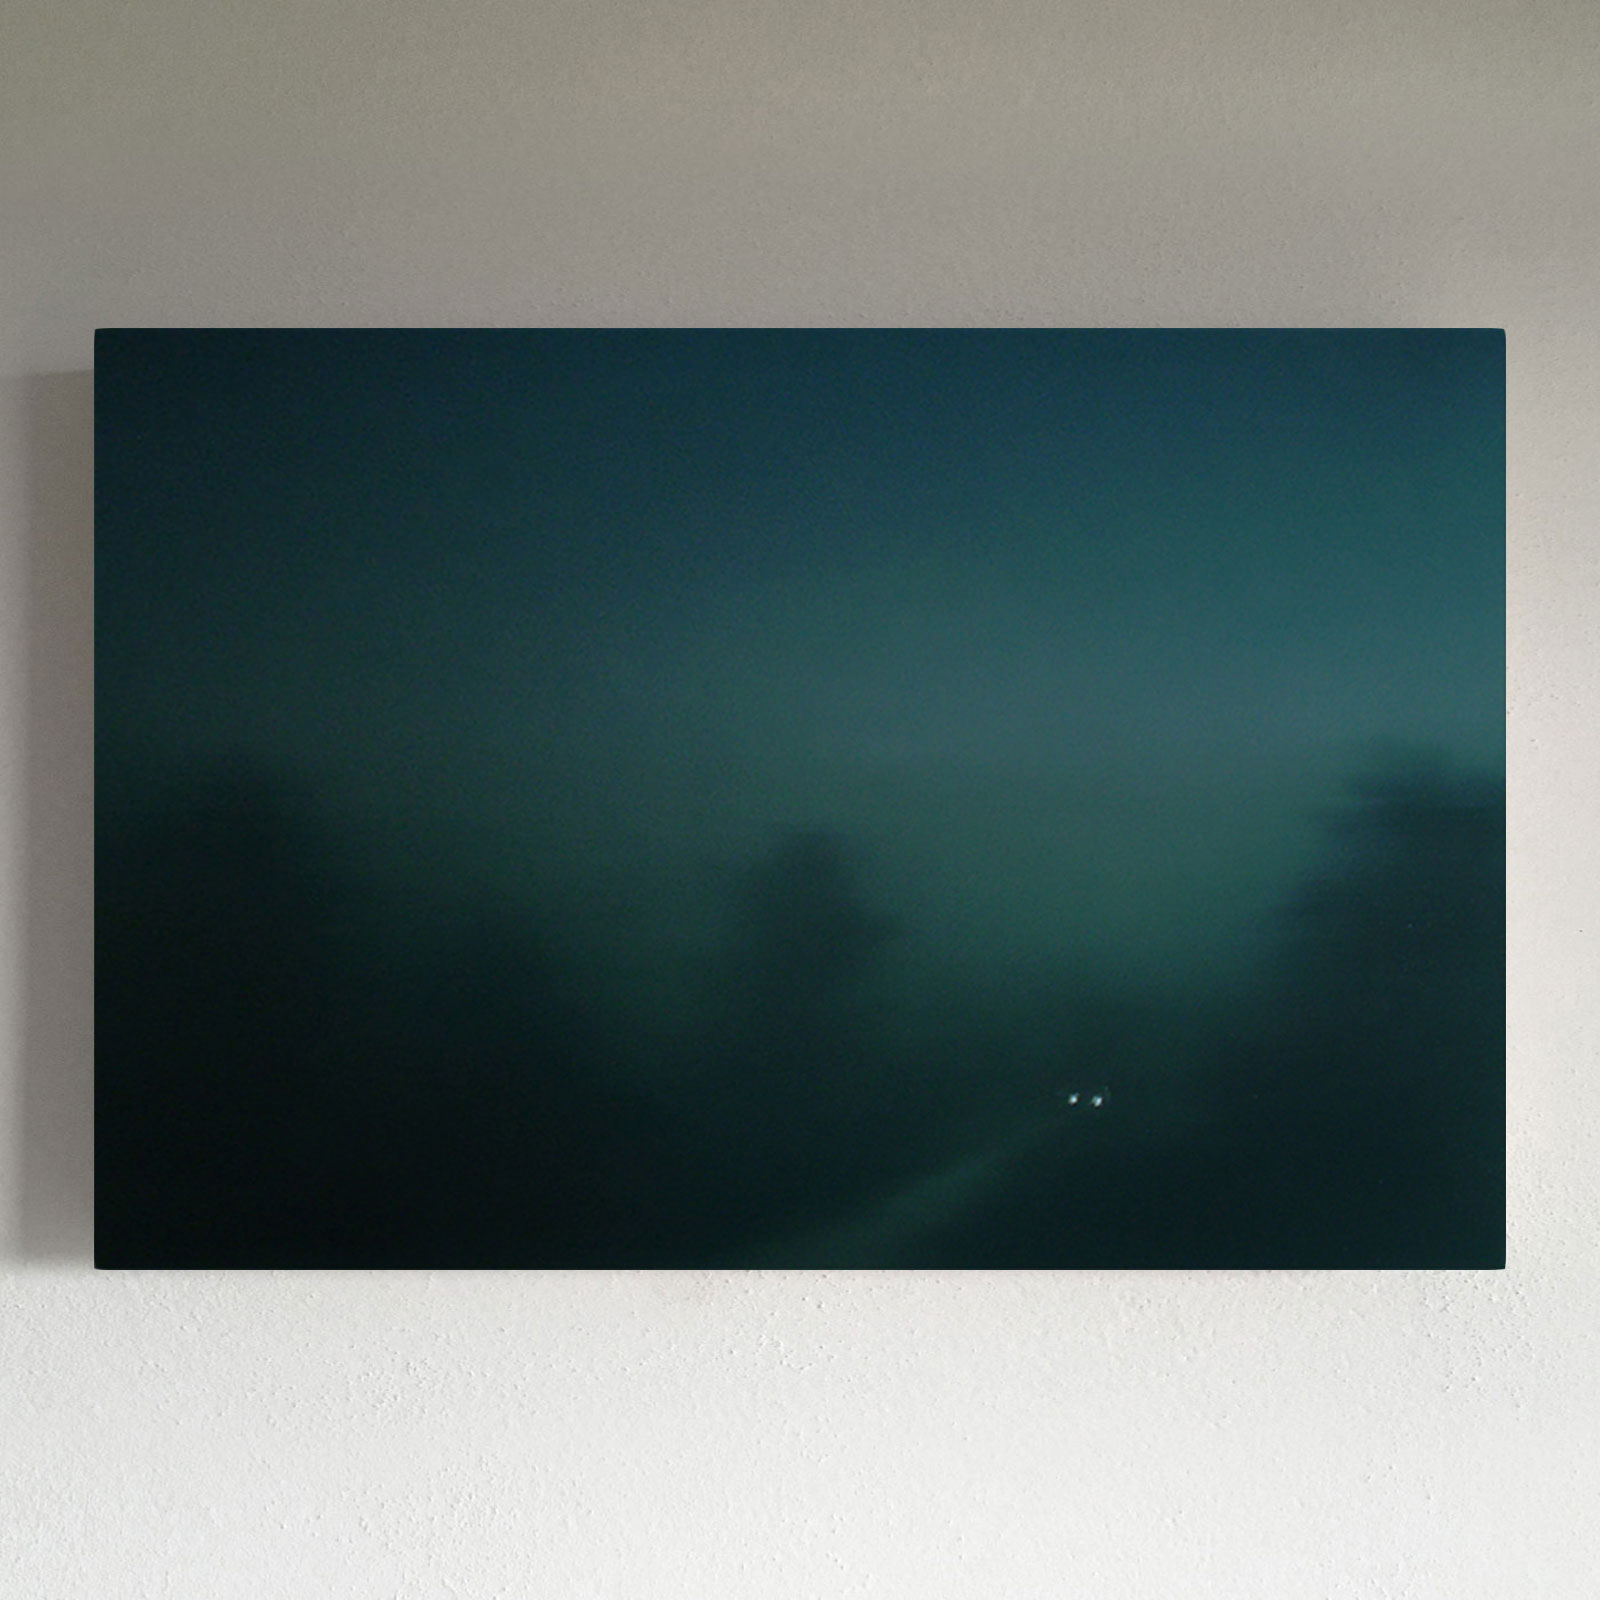 T#13-2009, oil on canvas, 80x120cm, priv. coll.